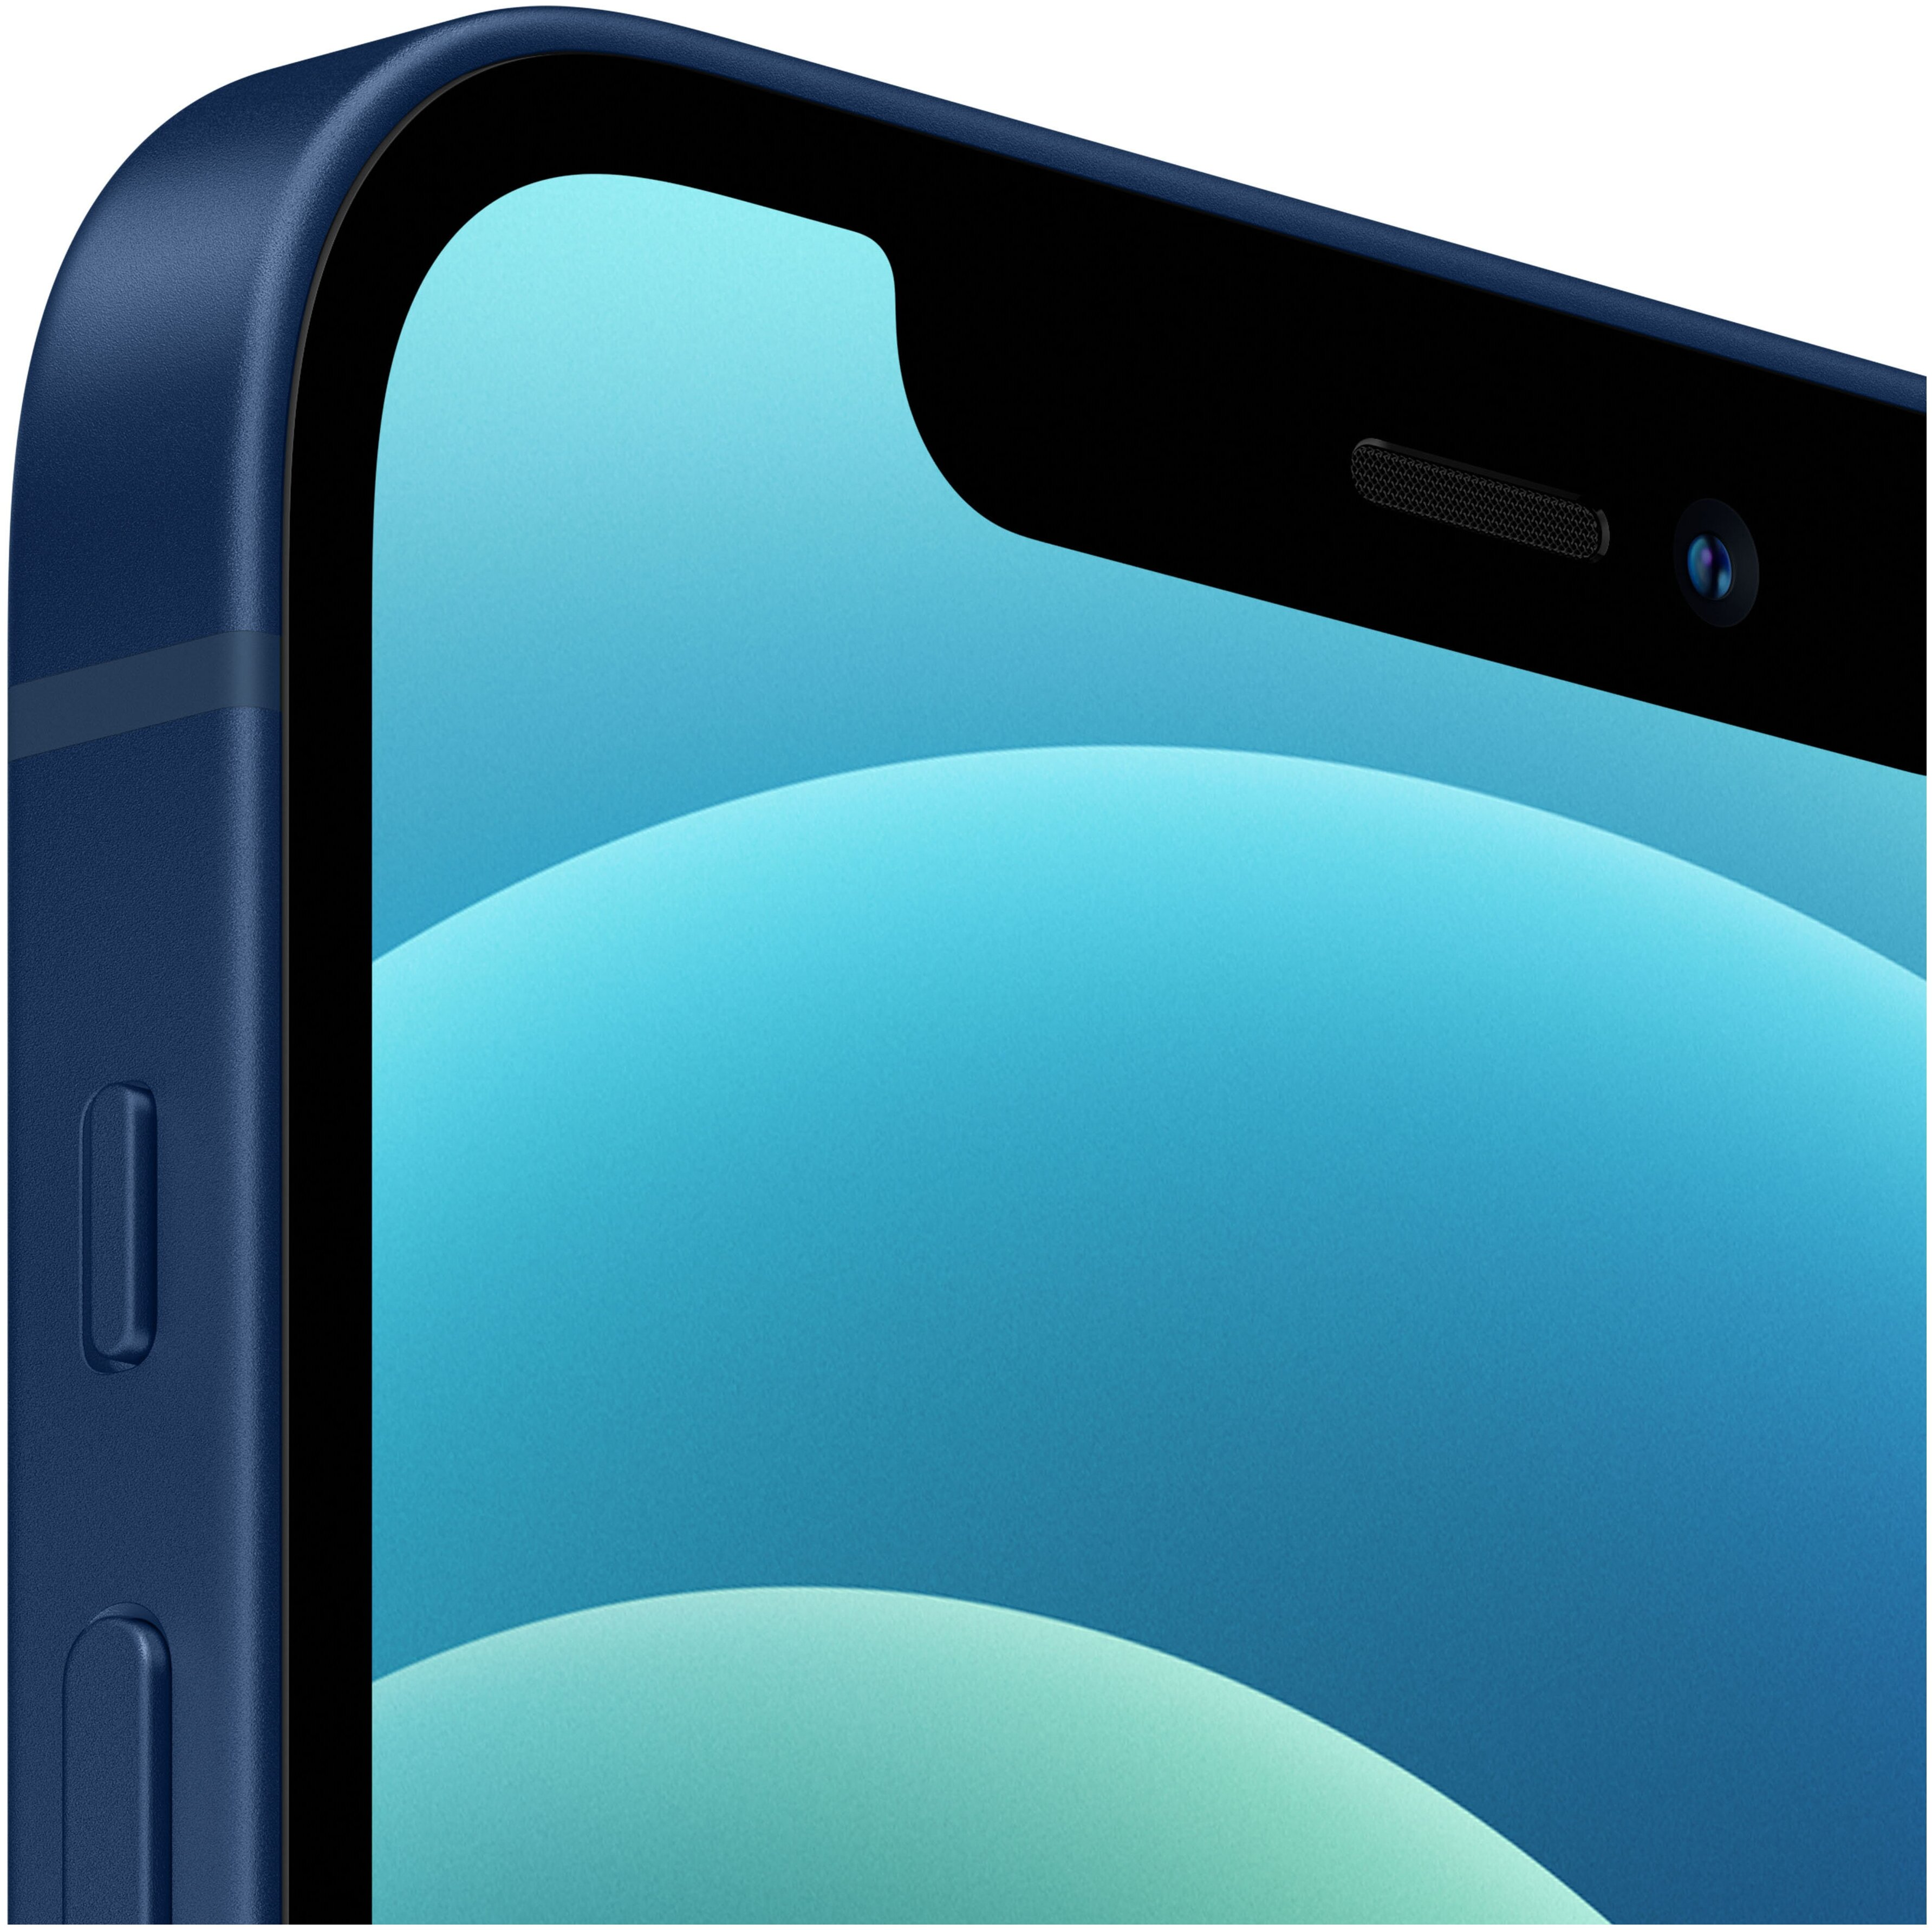 Apple iPhone 12 128GB - память: 128ГБ